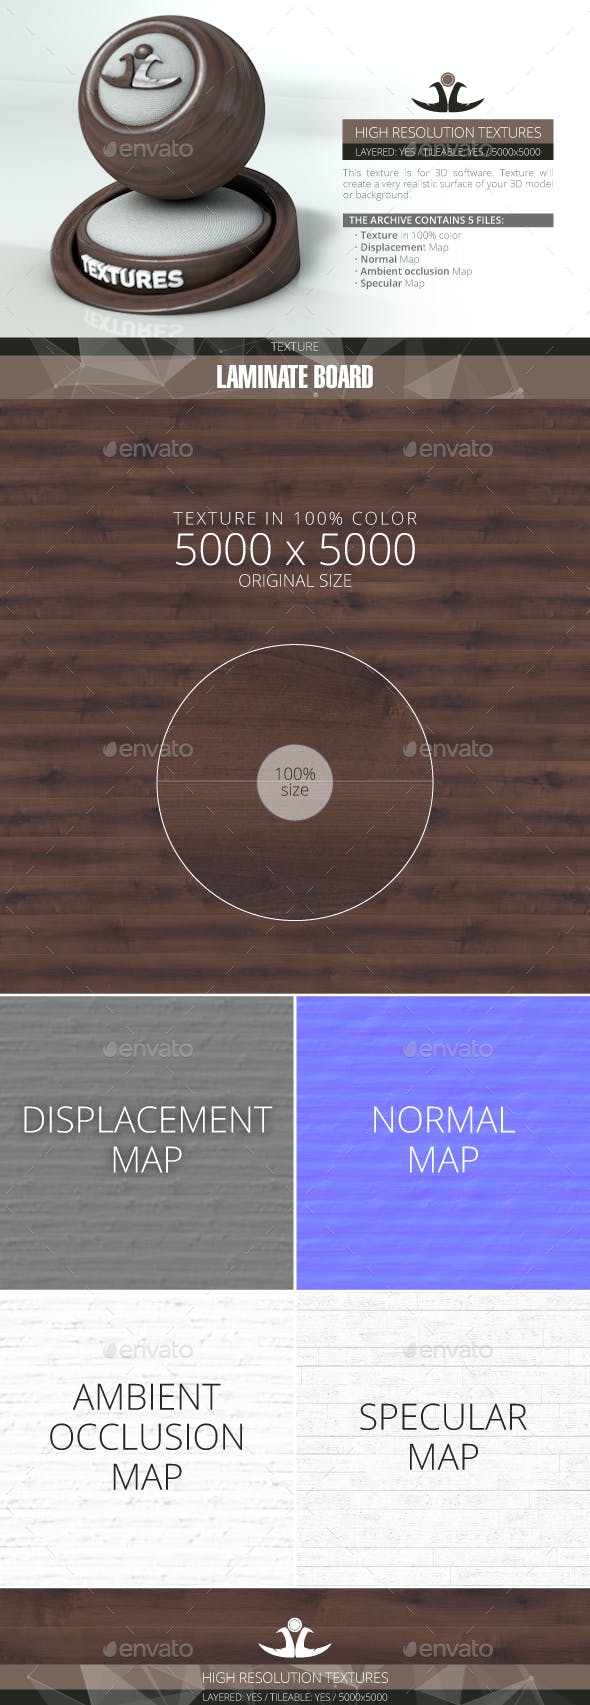 Laminate Board 56 - 3DOcean Item for Sale